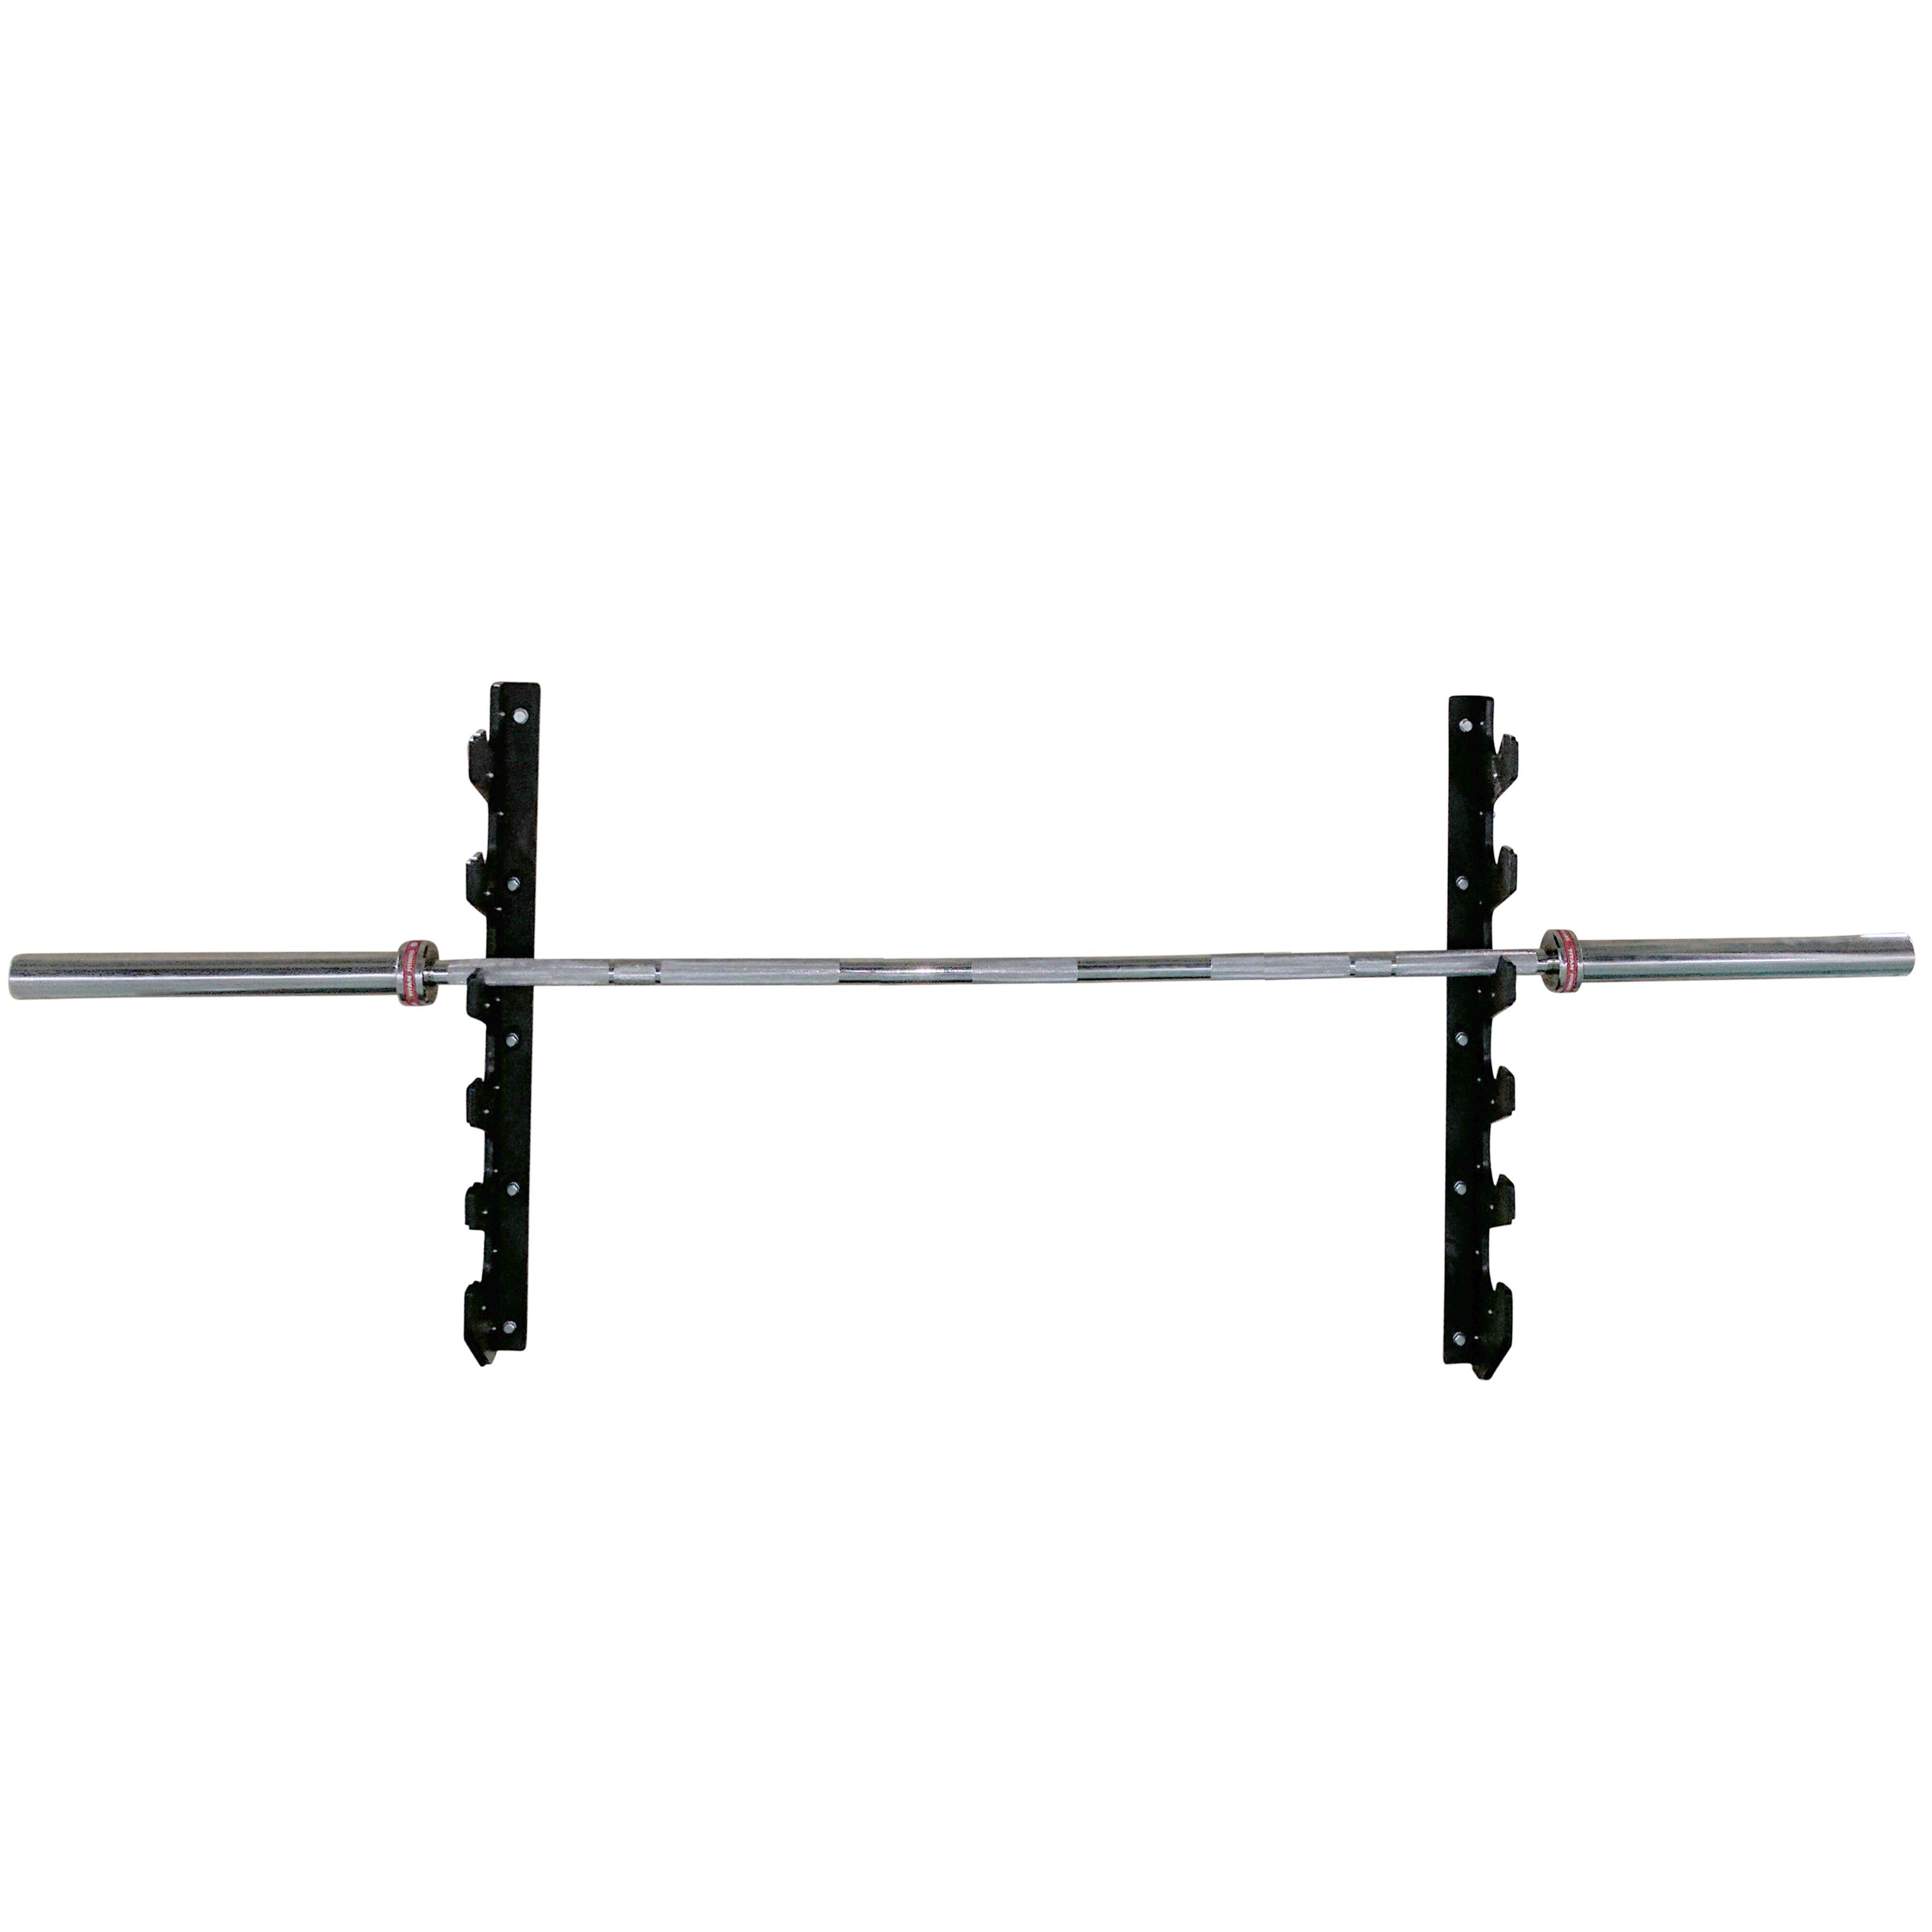 Body Power Wall Mounted Olympic Bar Storage